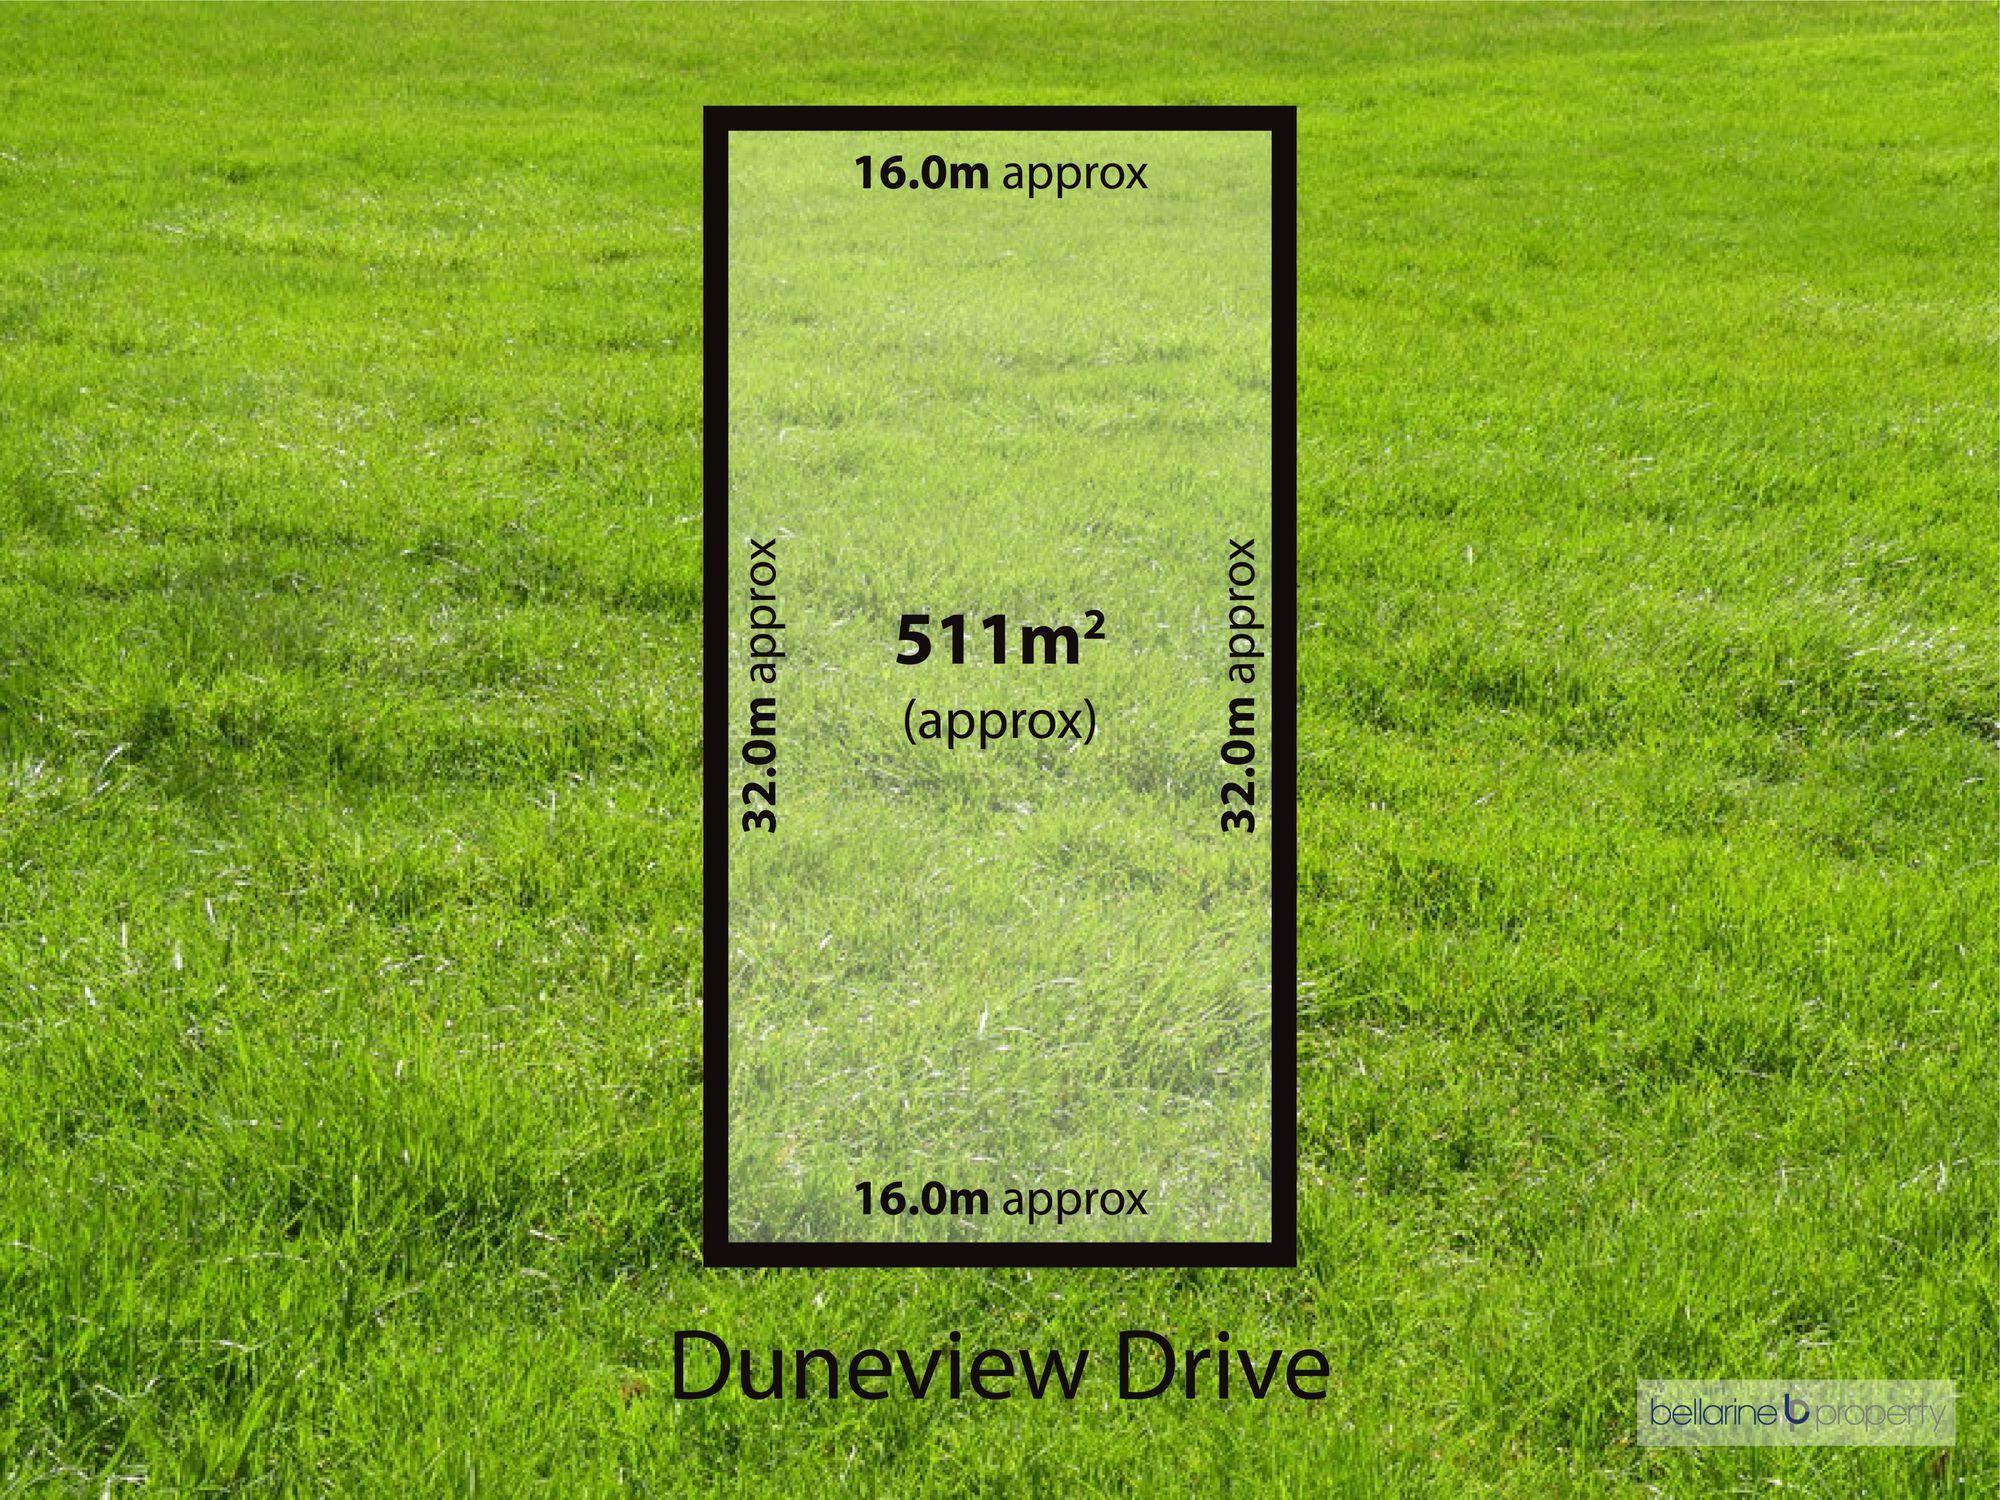 52 Duneview Drive, Ocean Grove VIC 3226